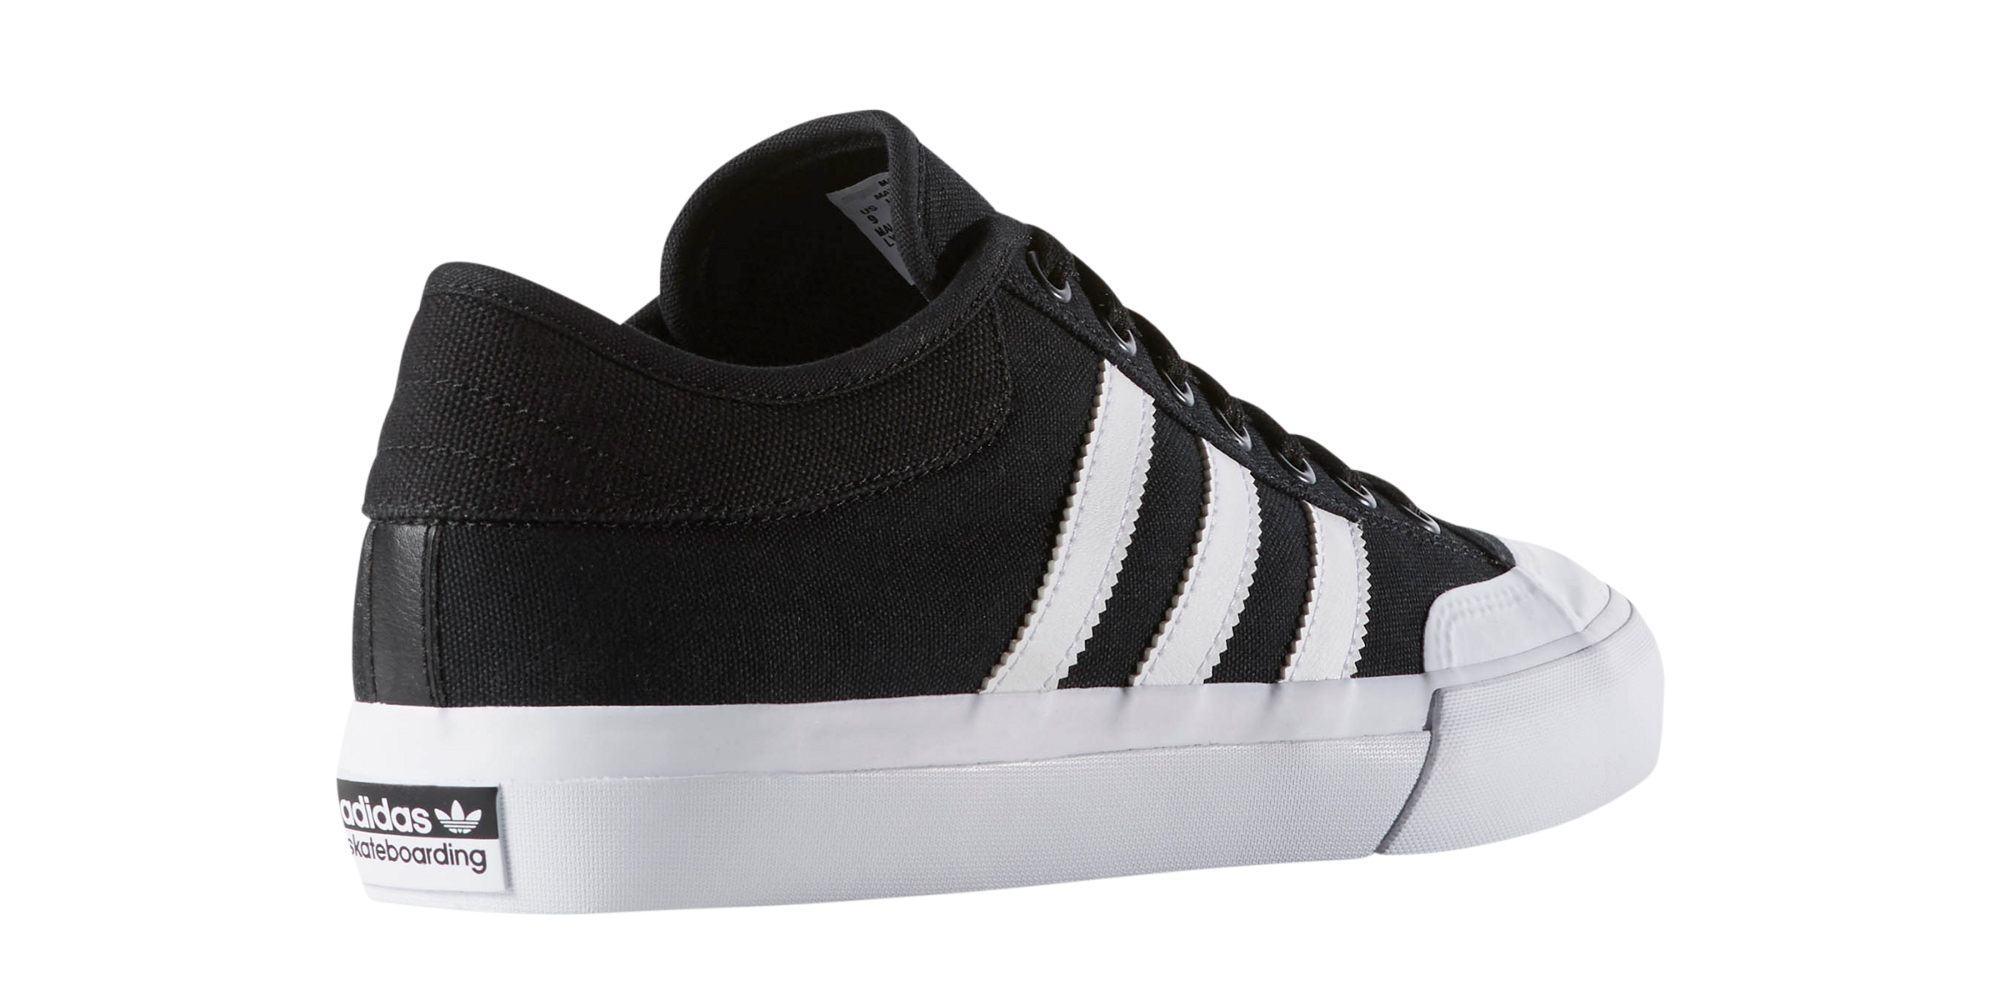 Baskets Chaussures Skateboarding Adidas Matchcourt Skate Toile tsQrhd